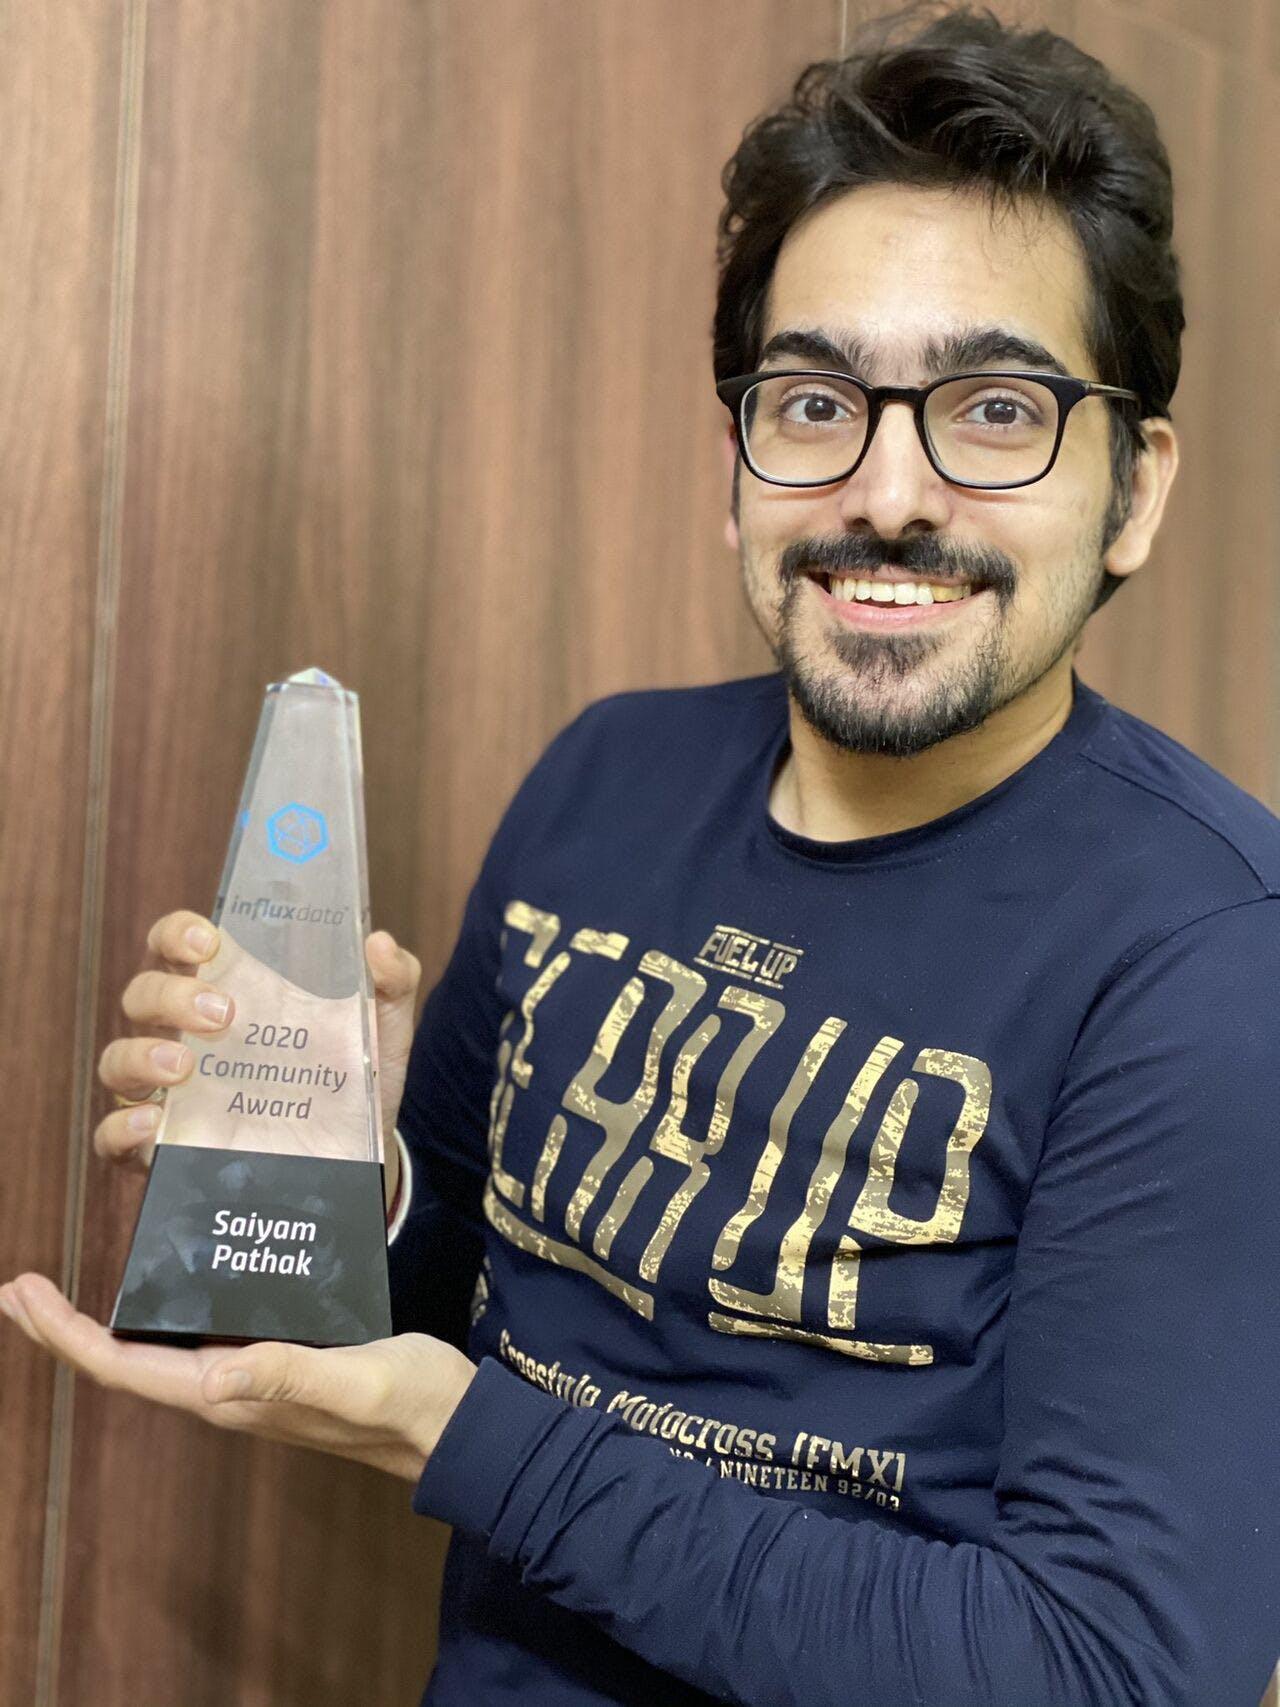 Docker and Influx Community Leader Award